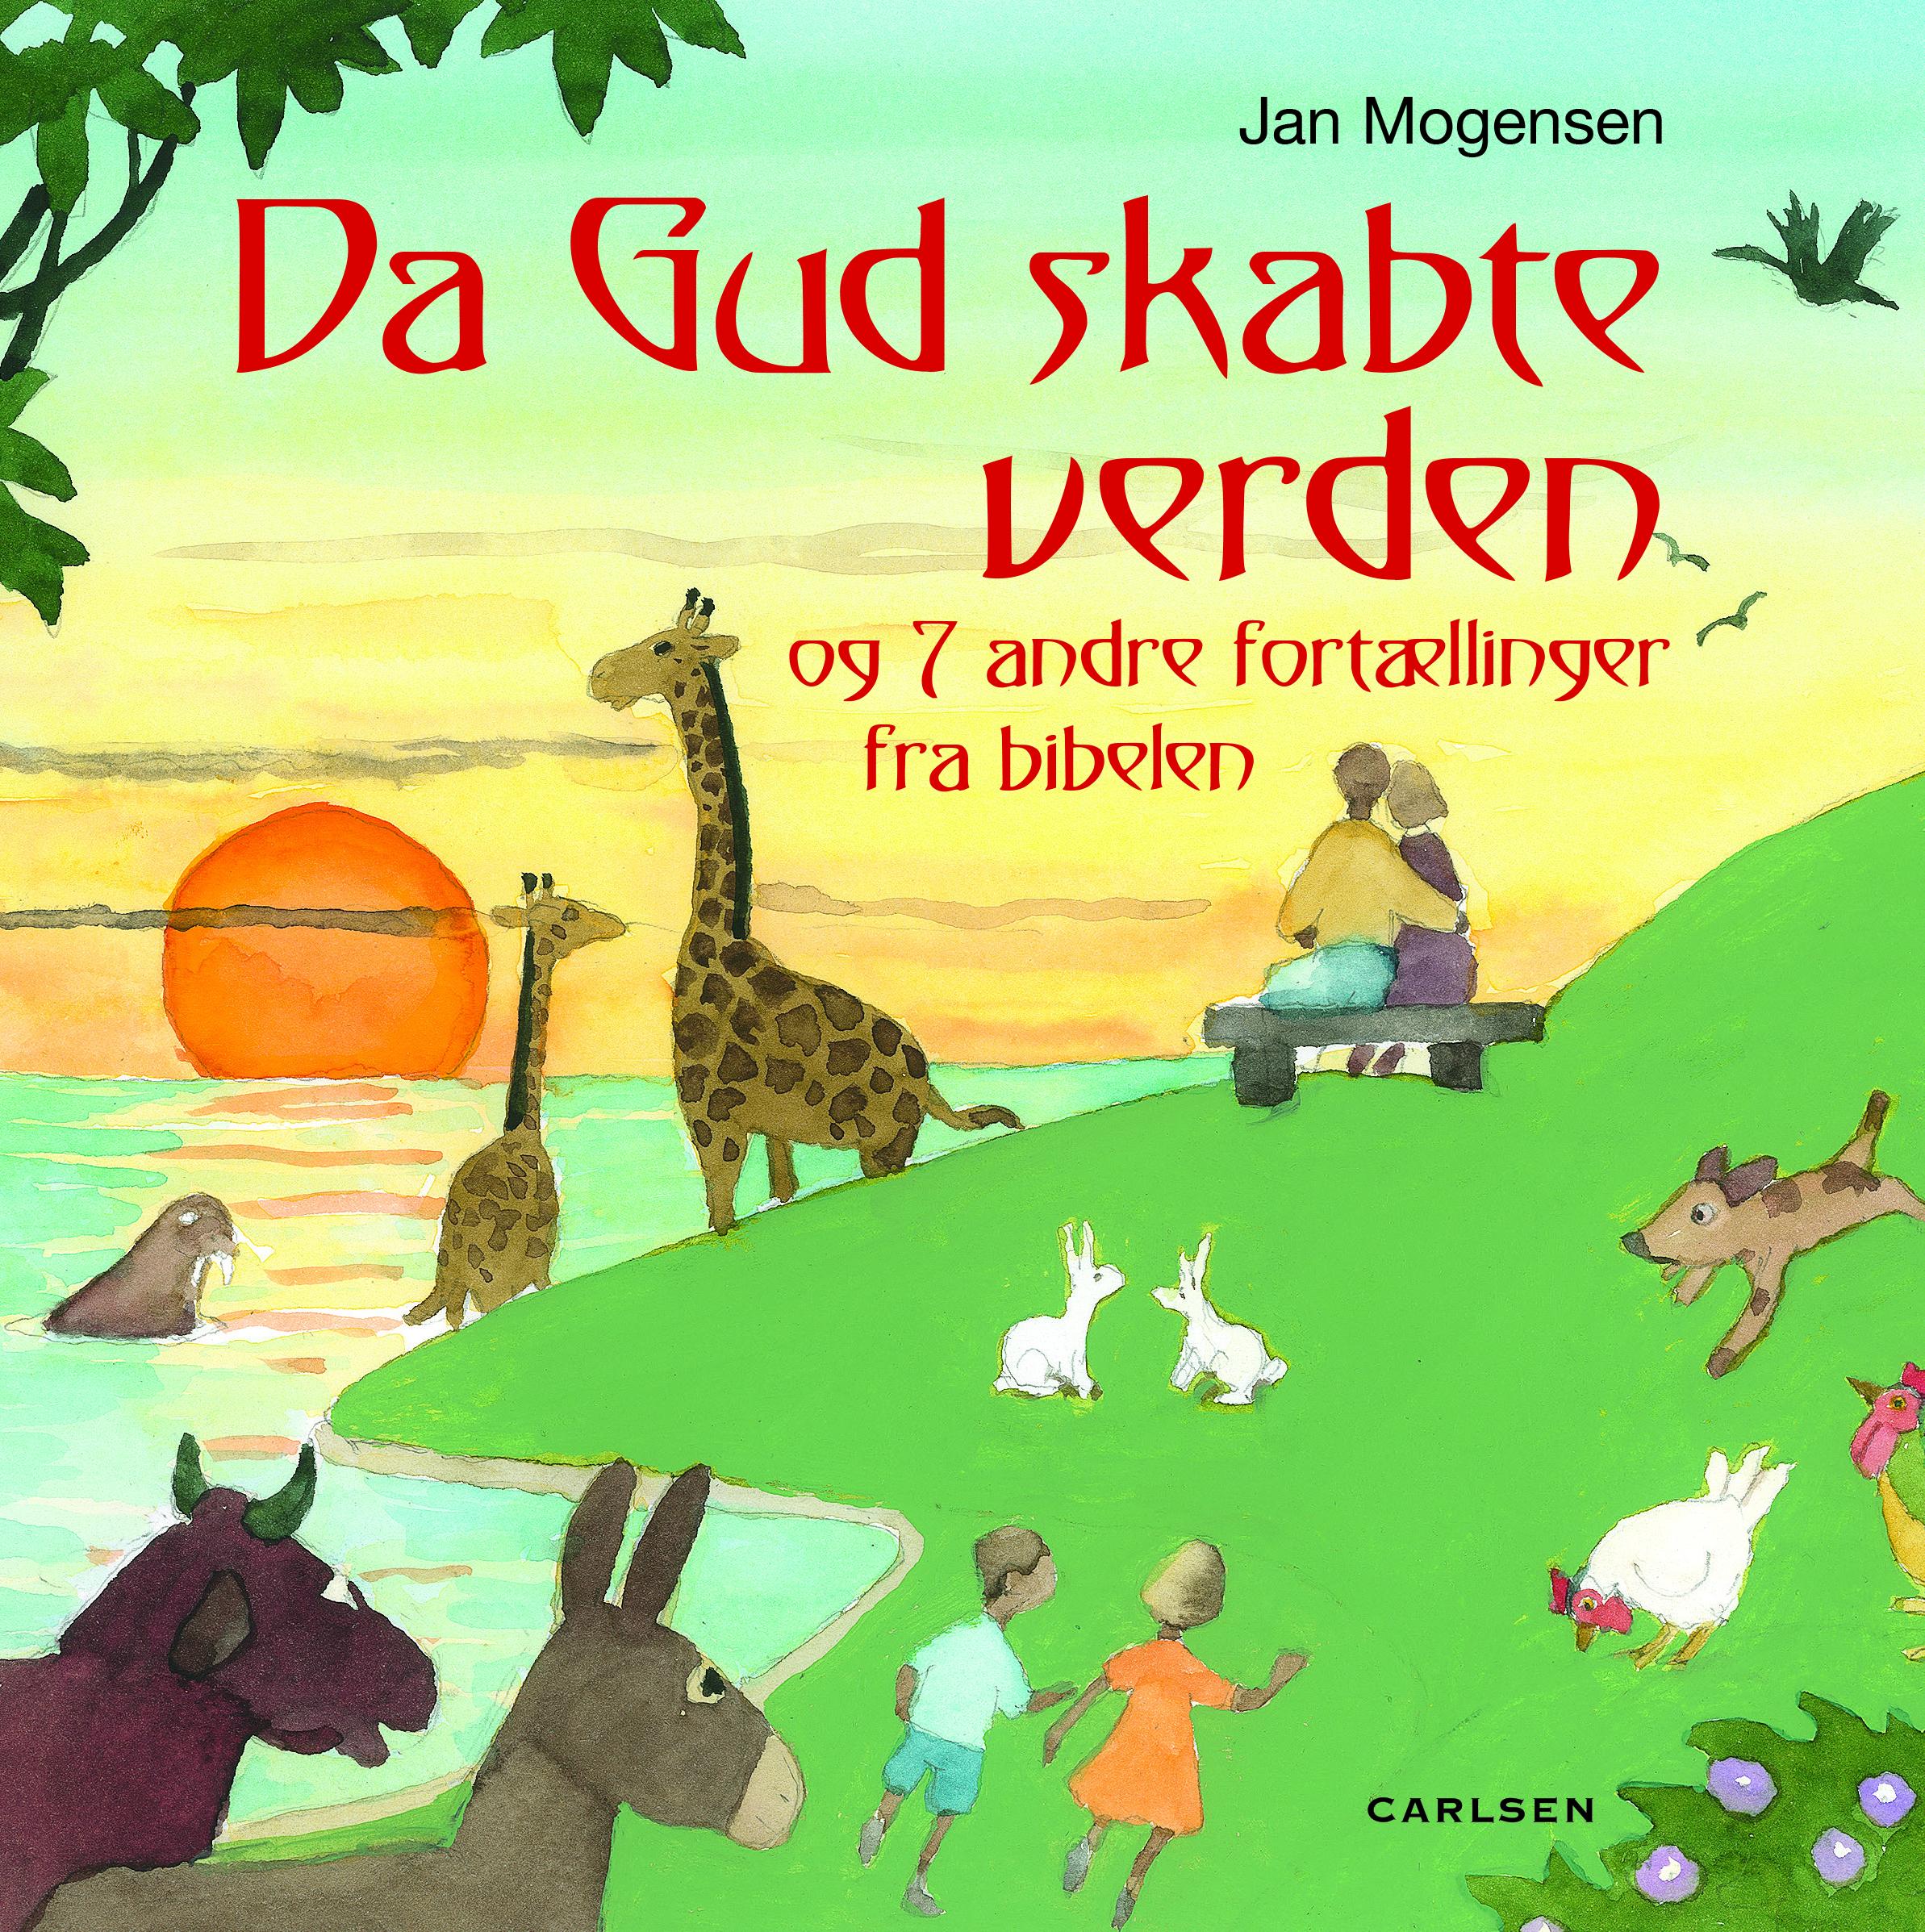 Da Gud skabte verden - Da Gud skabte verden - E-lydbog